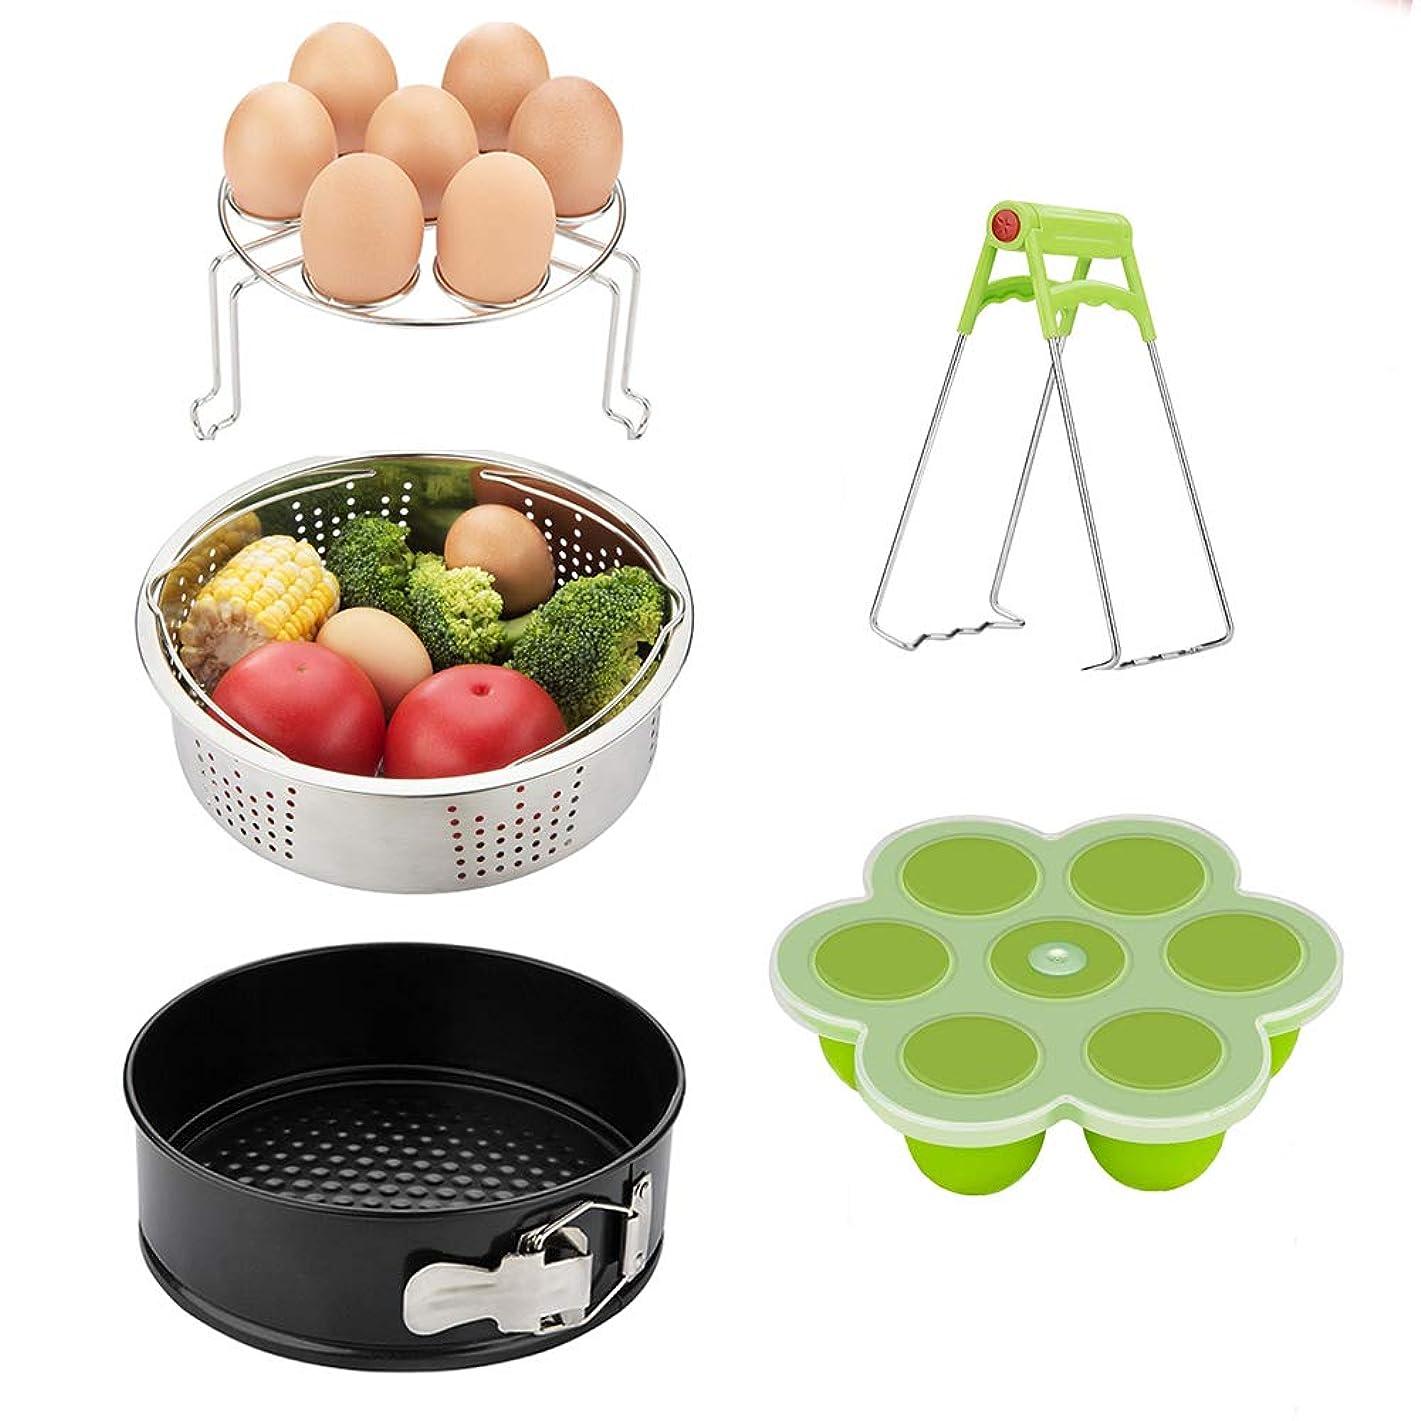 Mery Instant Pot Accessories Set-Fits 5,6,8Qt Instapot Pressure Cooker, 5Pcs Basket Steamer Rack Egg Bites Molds Non-Stick Springform Pan DishClip White